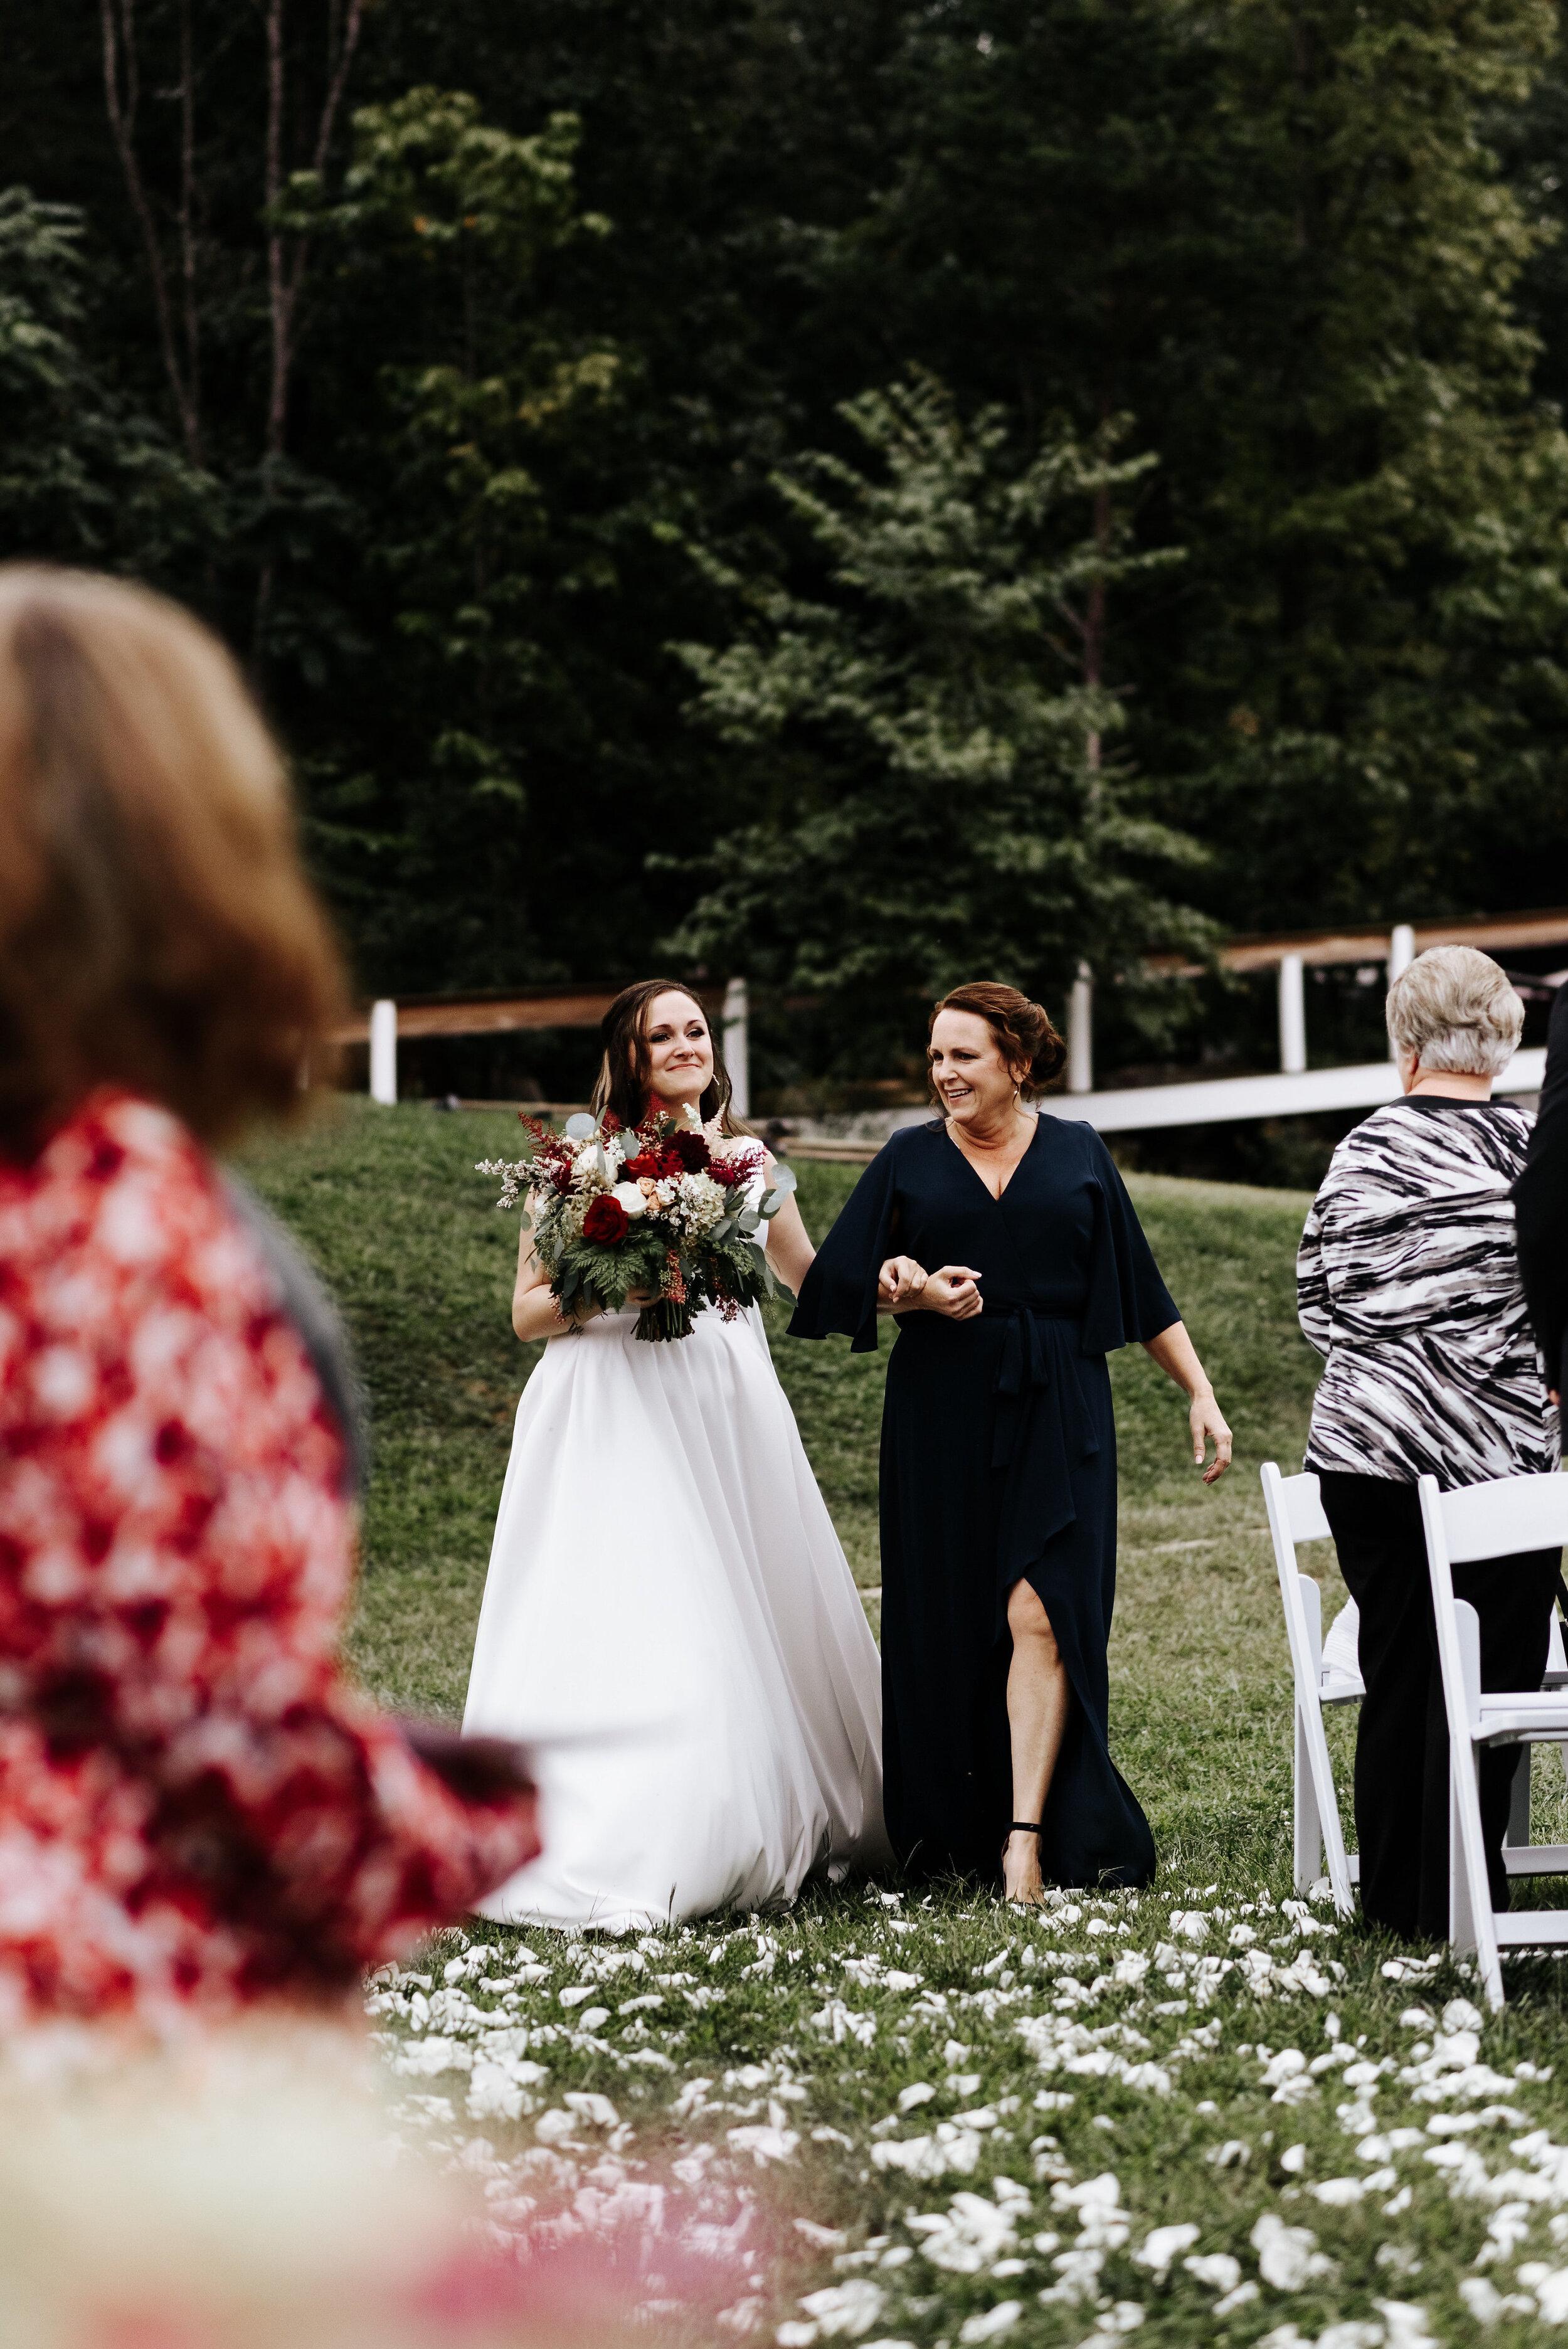 Allison_Nolan_Moss_Vineyards_Wedding_Charlottesville_Virginia_Photography_by_V_41.jpg